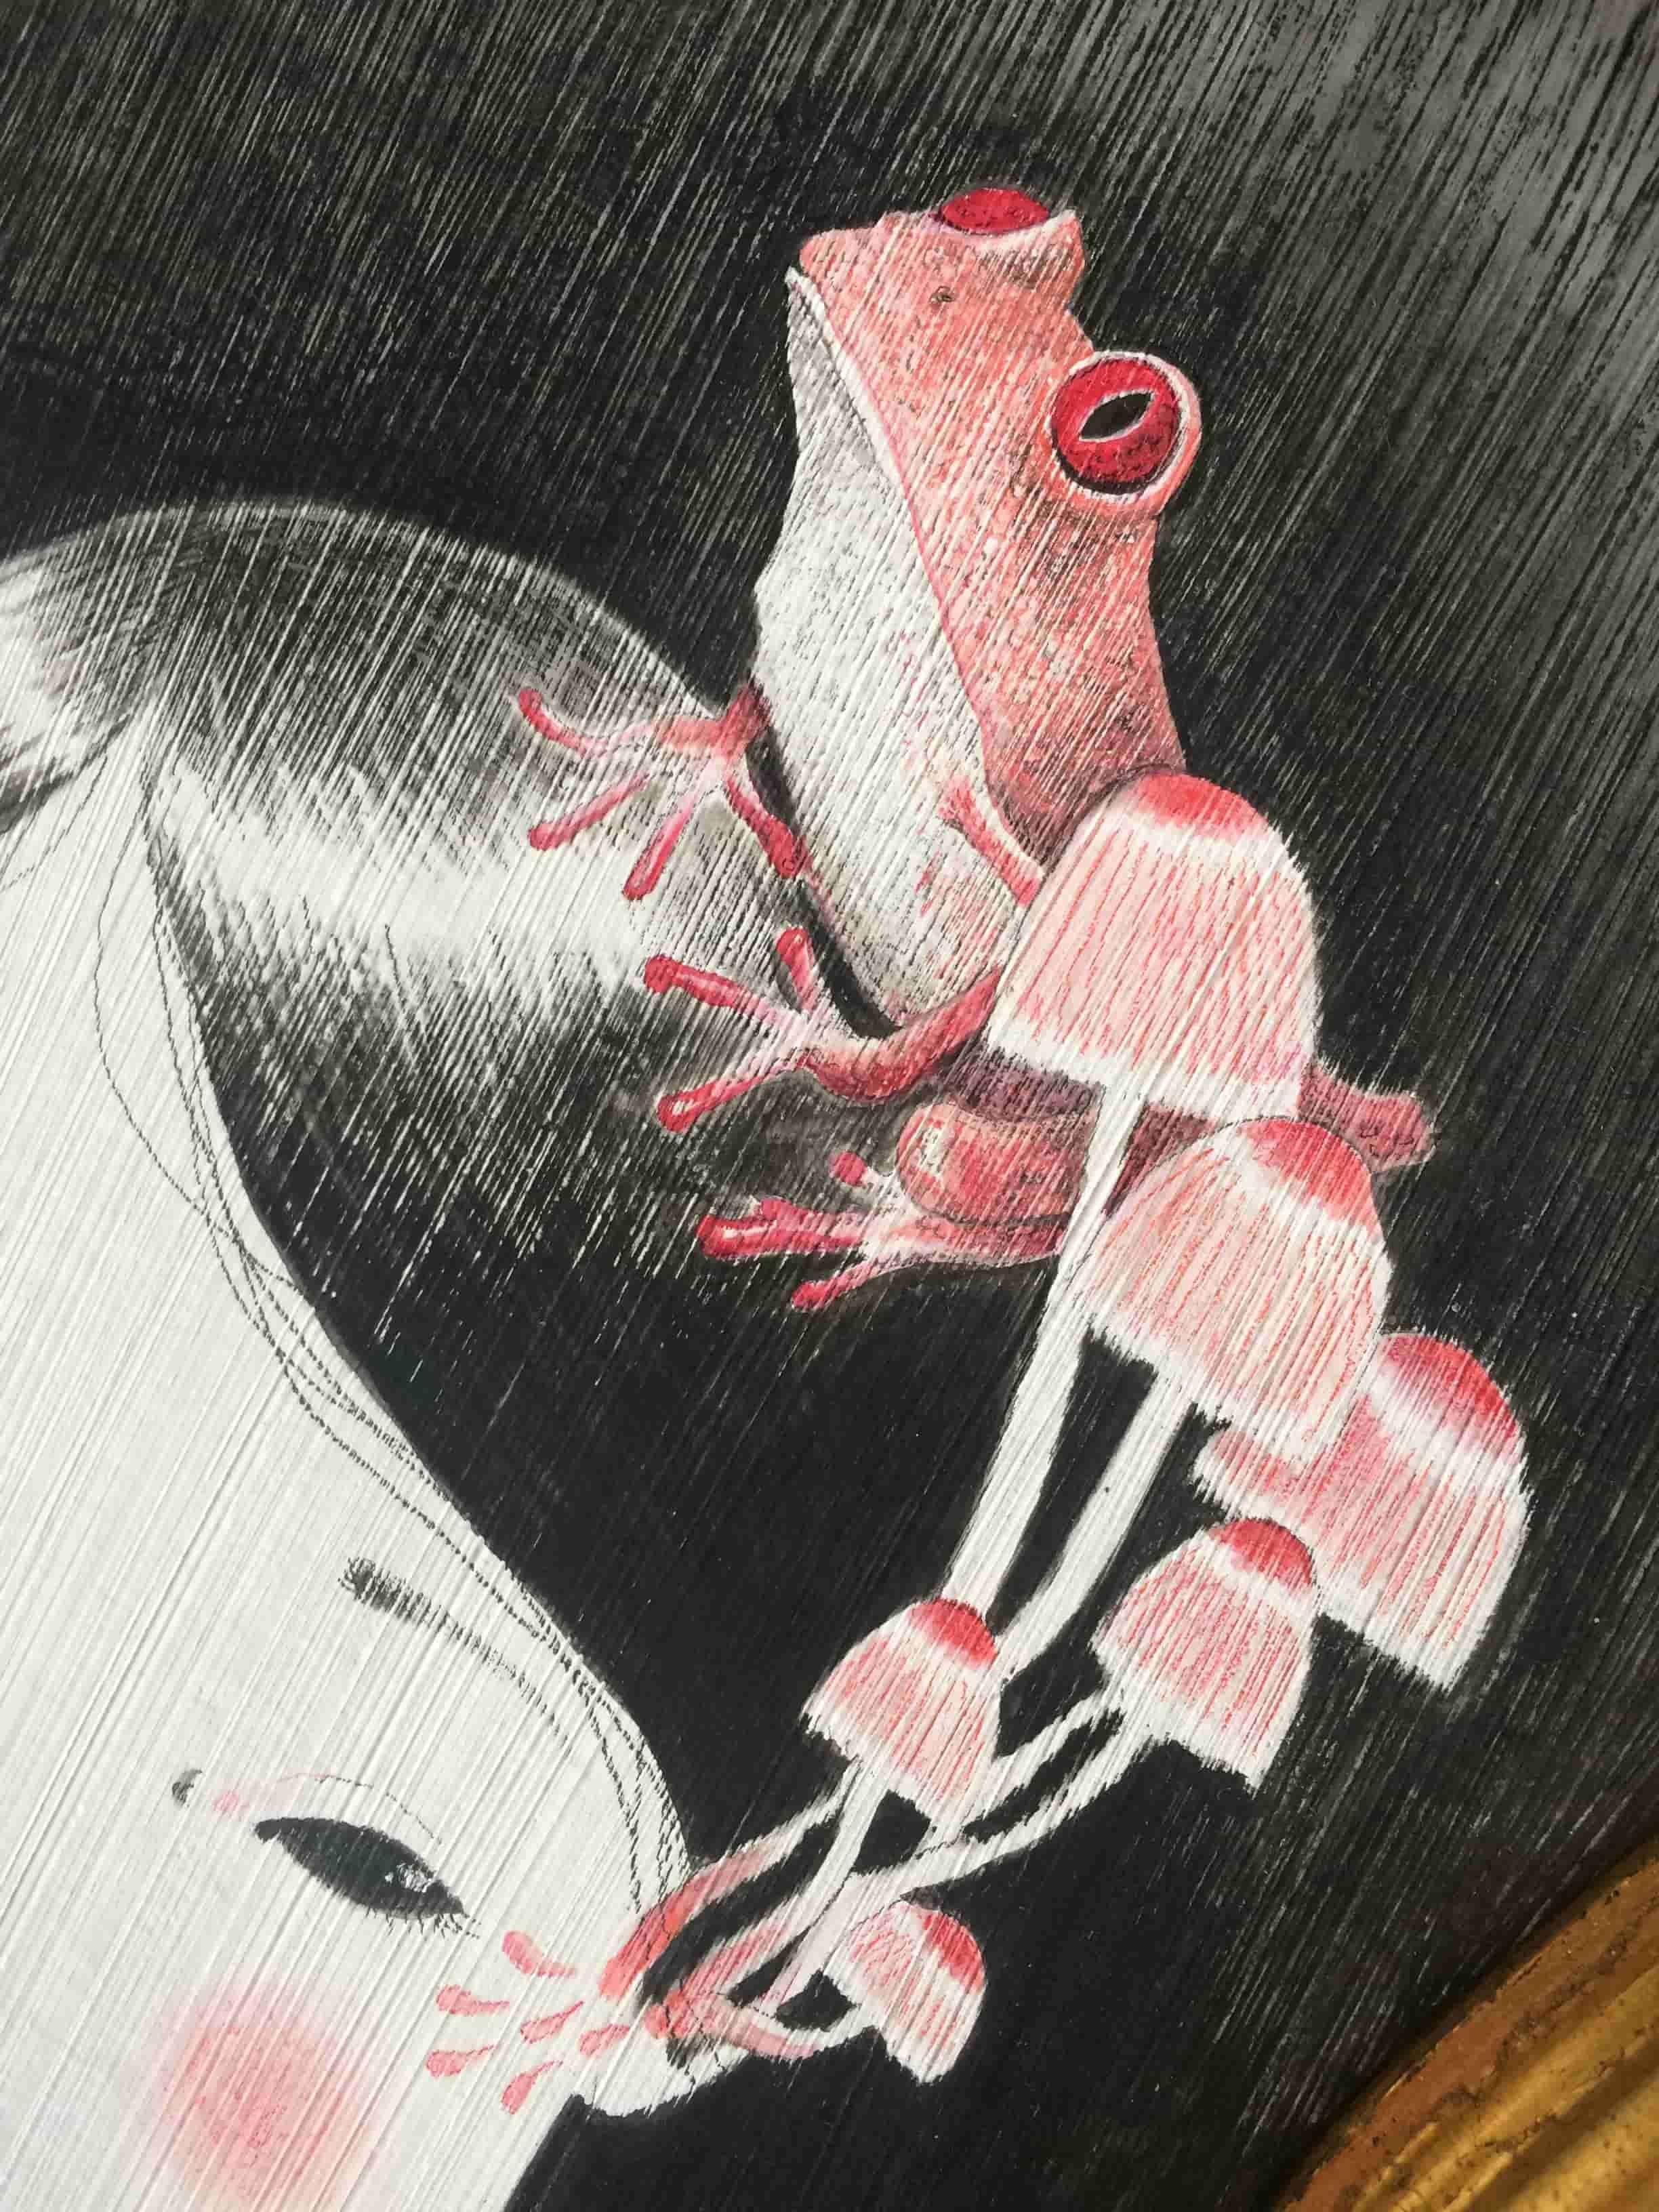 seforapons-acrylics-graphite-colouredpencils-symbiosis-pink-frog-mushroom-kaeruchan-3